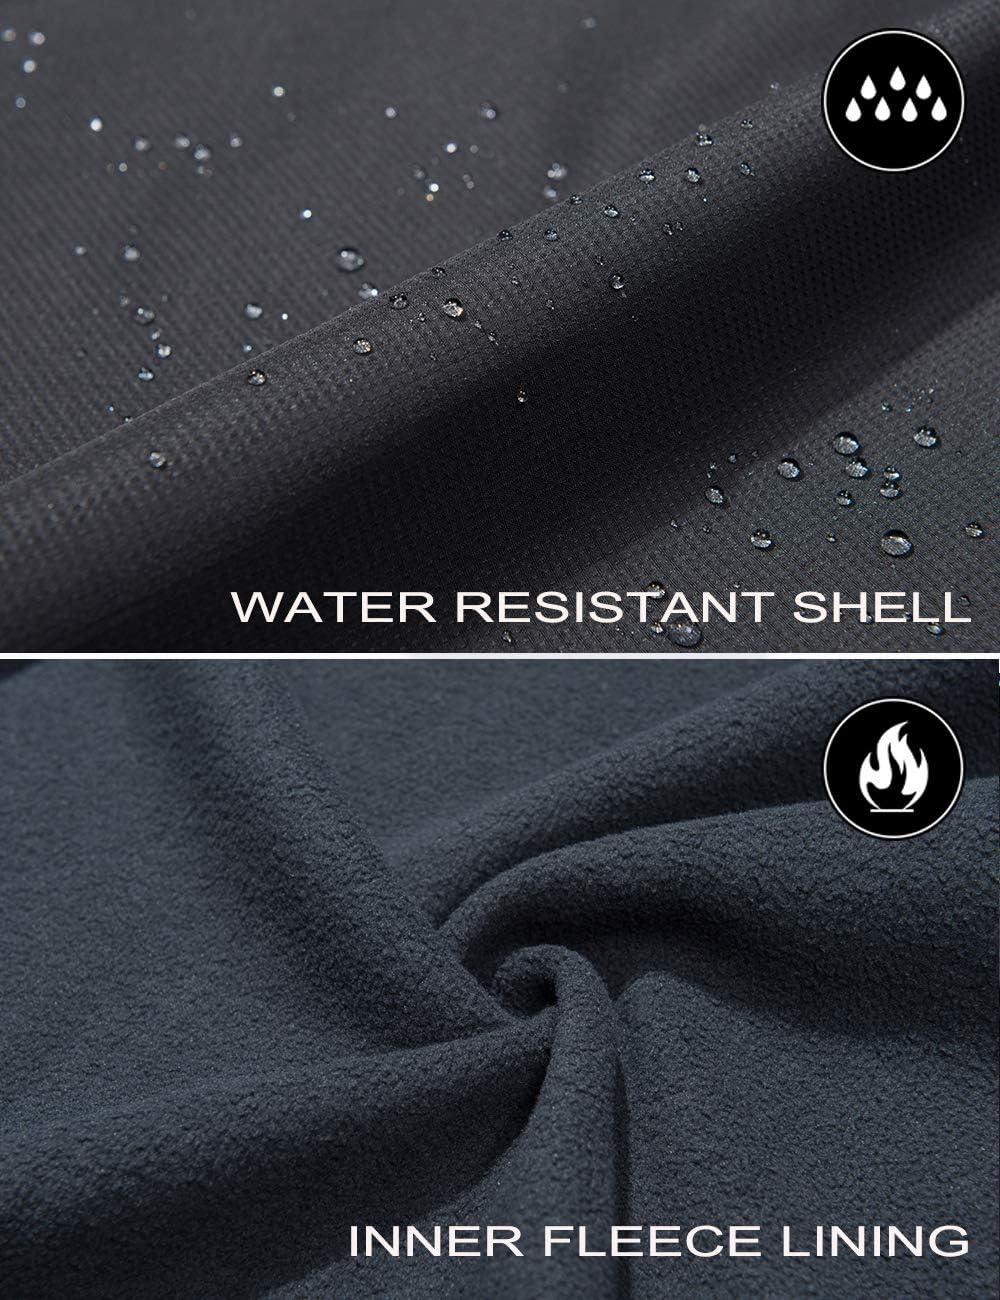 Resistente al Agua Chaqueta de esqu/í de Forro Polar con Capucha Desmontable TACVASEN Chaqueta 3 en 1 para Hombre